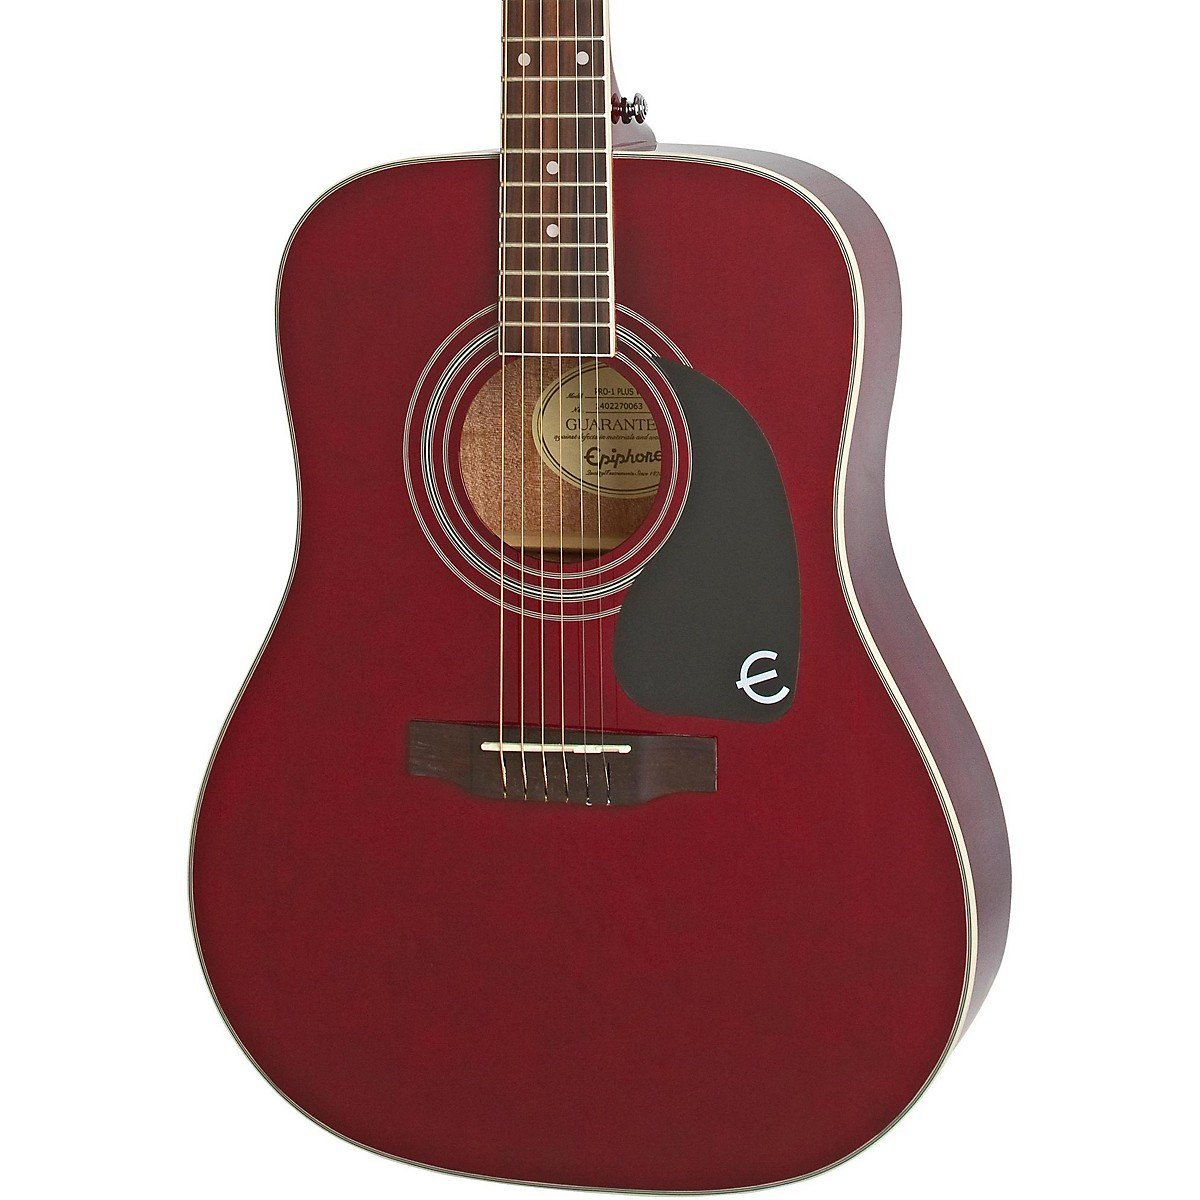 epiphone pro 1 plus eappwrch1 wine red akustik gitar mydukkan